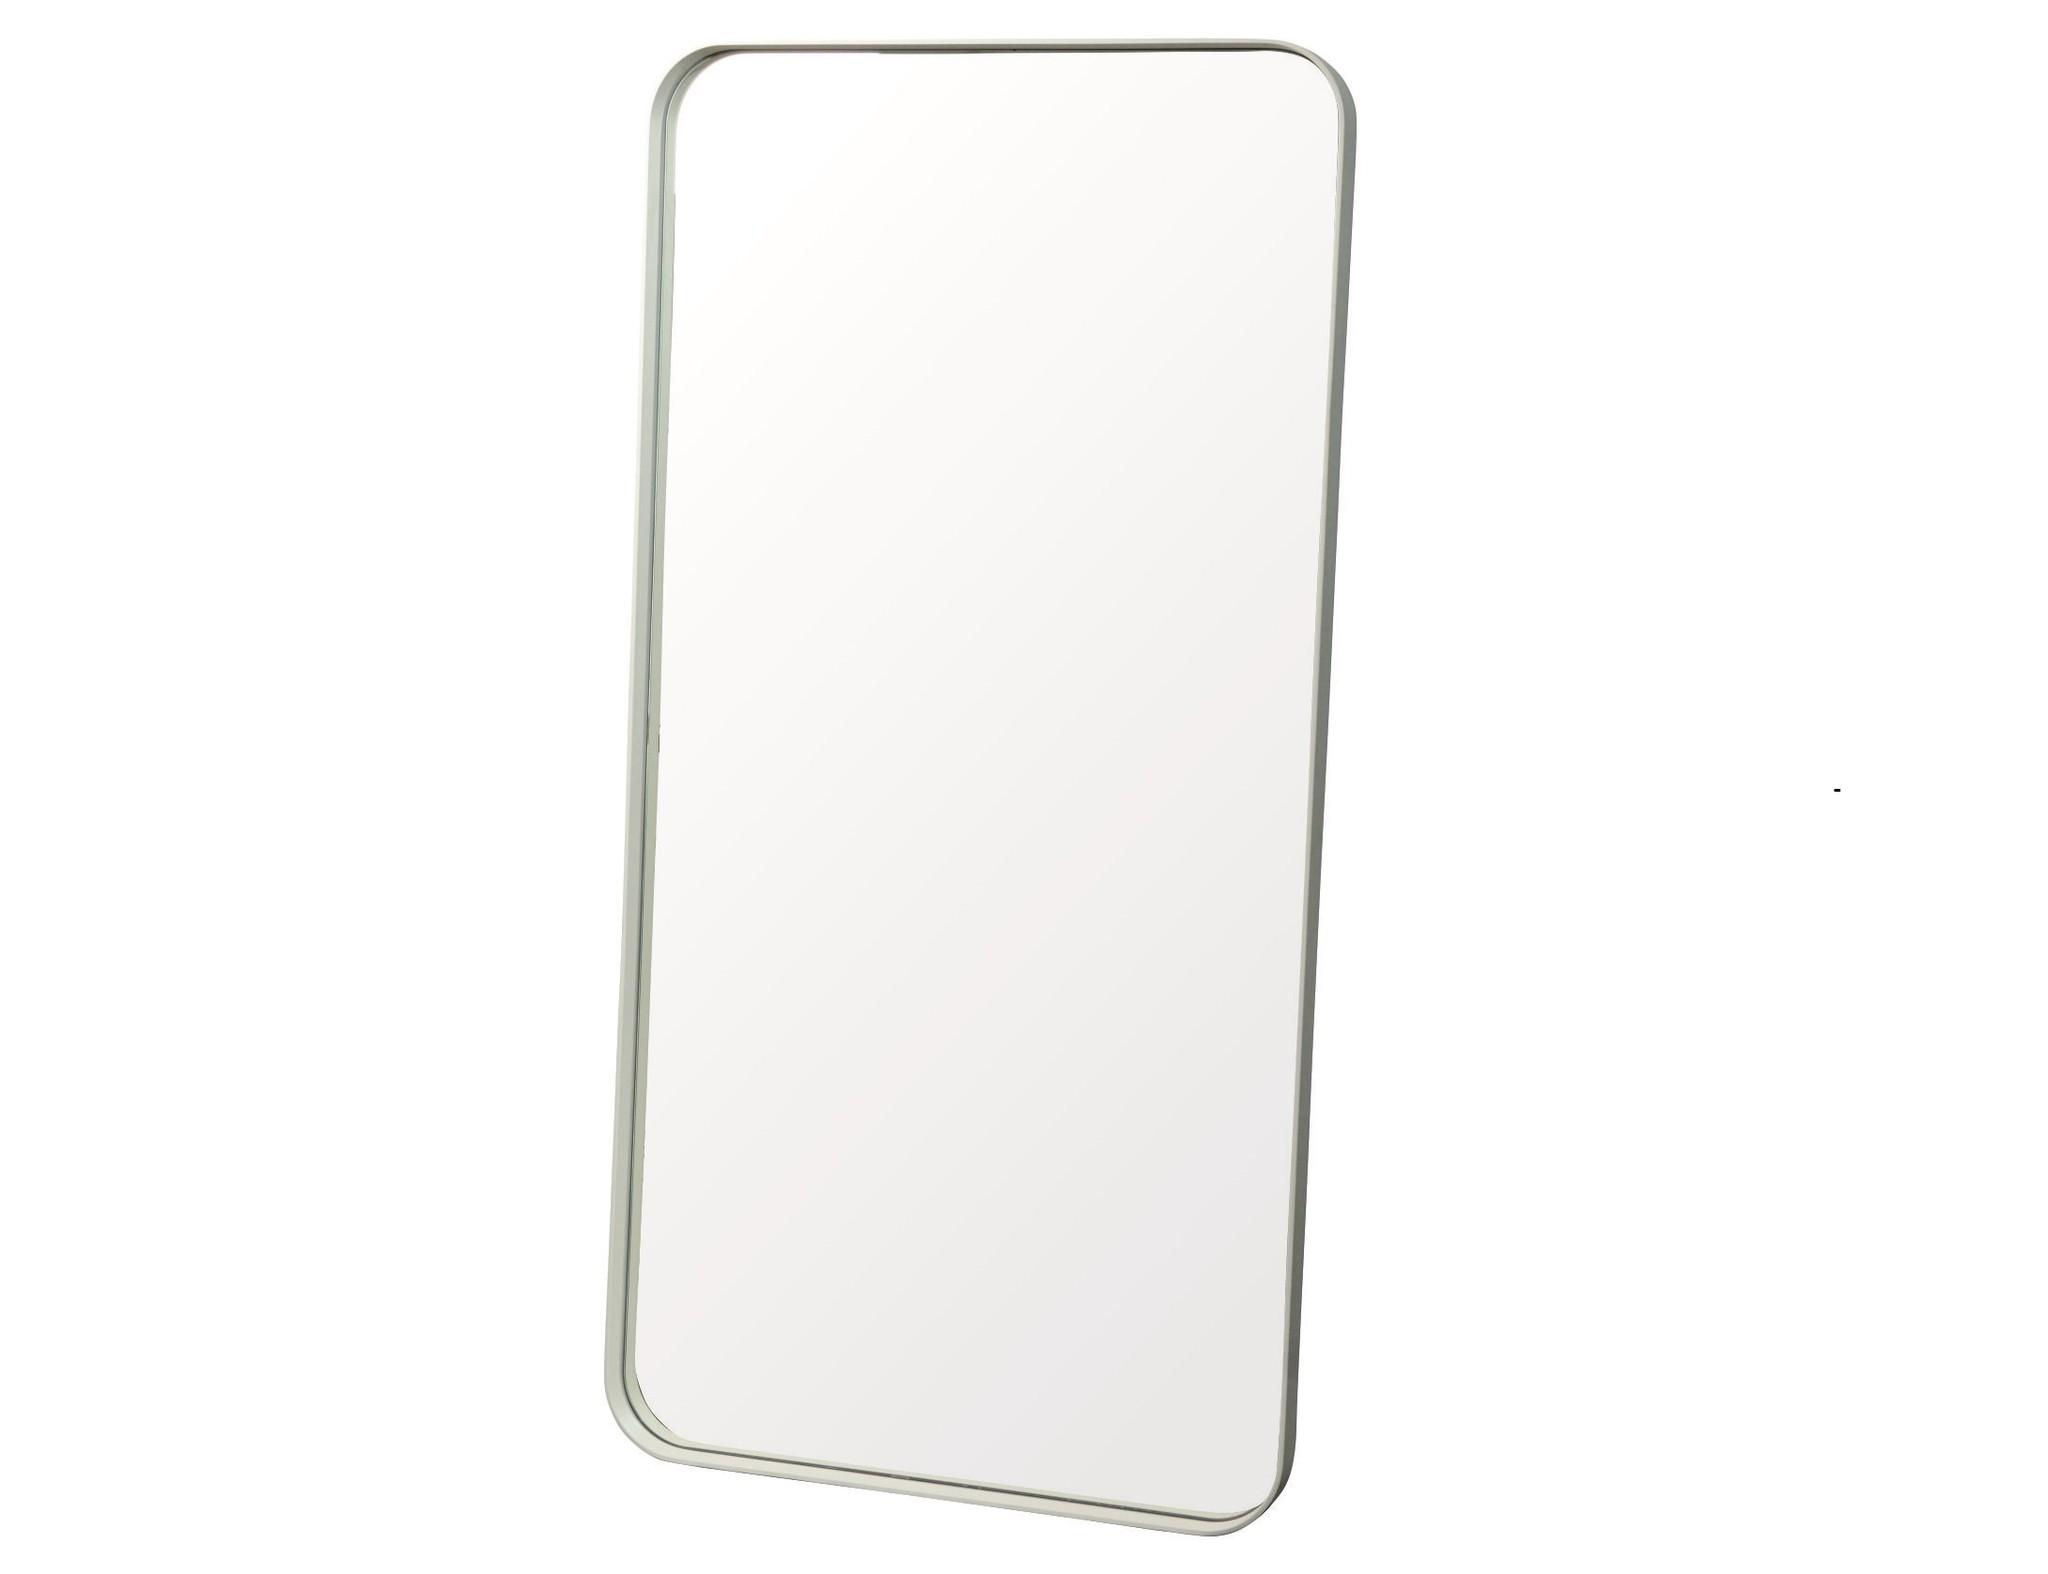 Настенное зеркало кира 100*40 (simple mirror) белый 40x100x4 см.